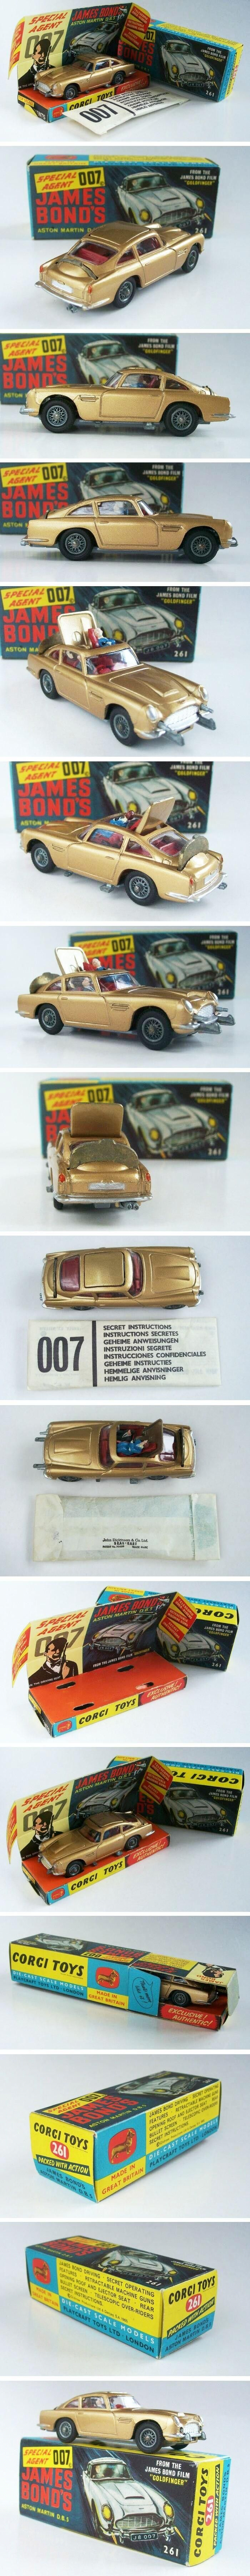 Corgi James Bond Aston Martin DB5 C270